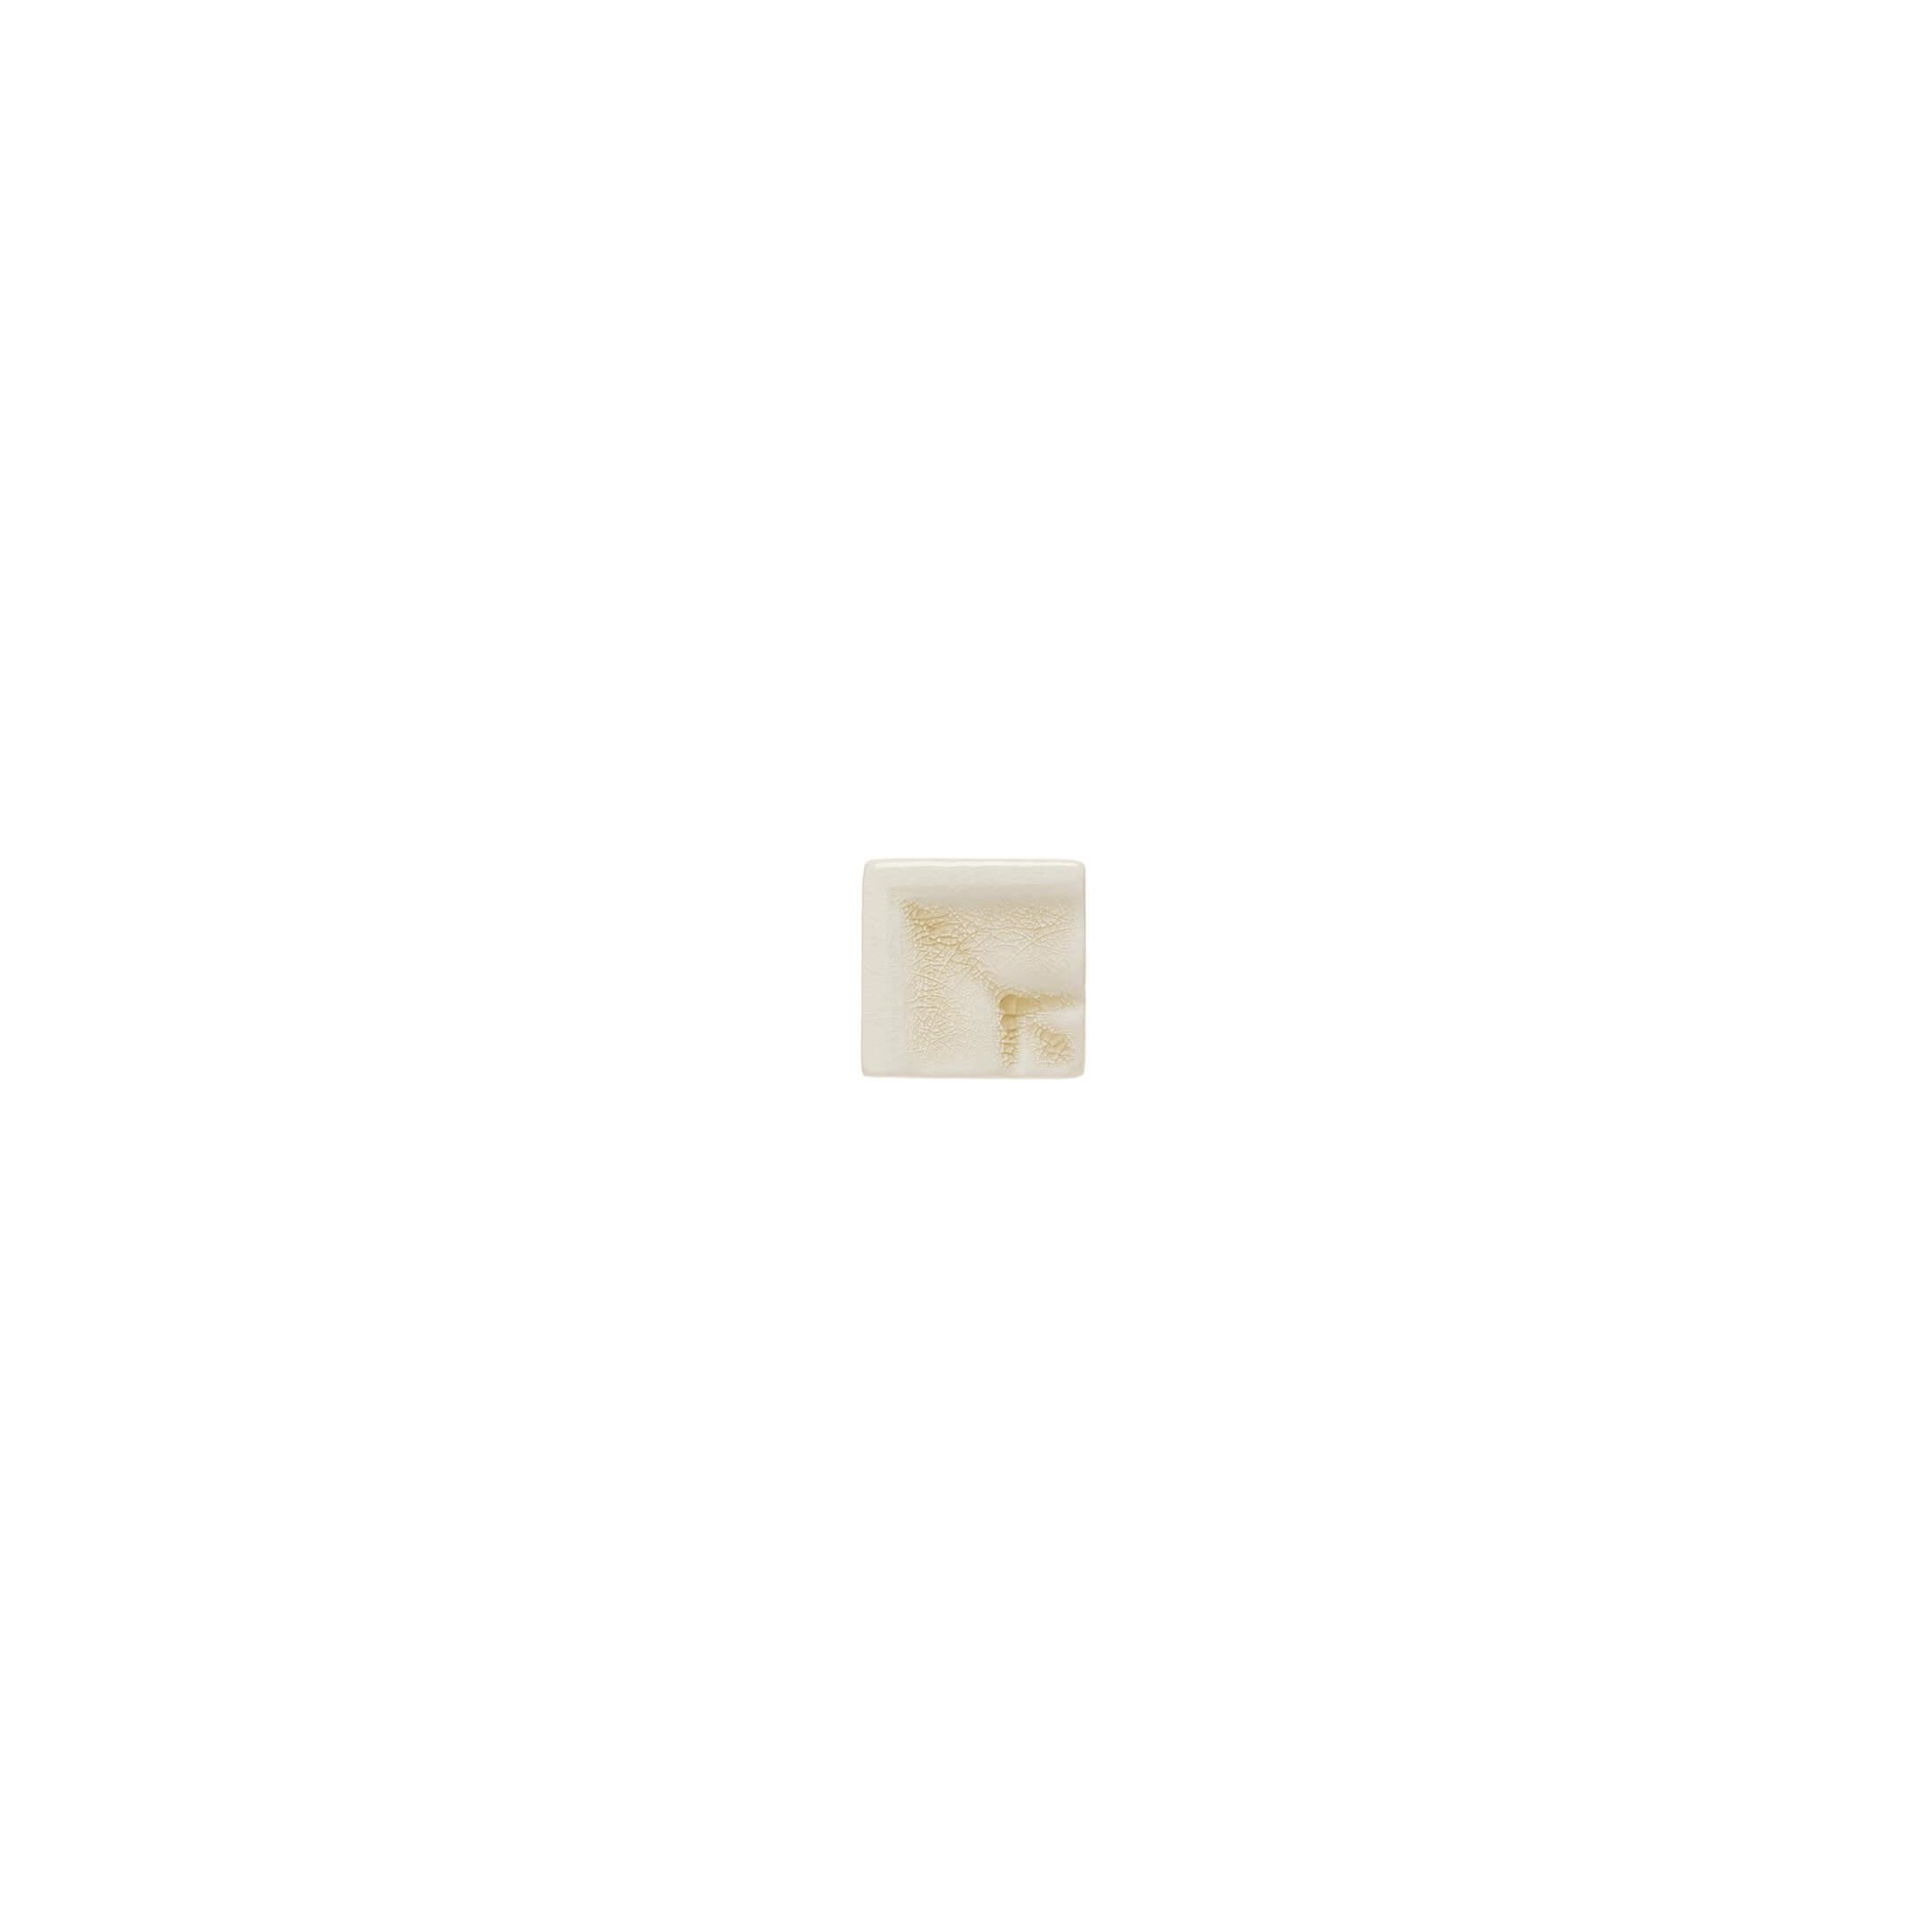 ADOC5073 - ANGULO MARCOCORNISA - 3 cm X 15 cm